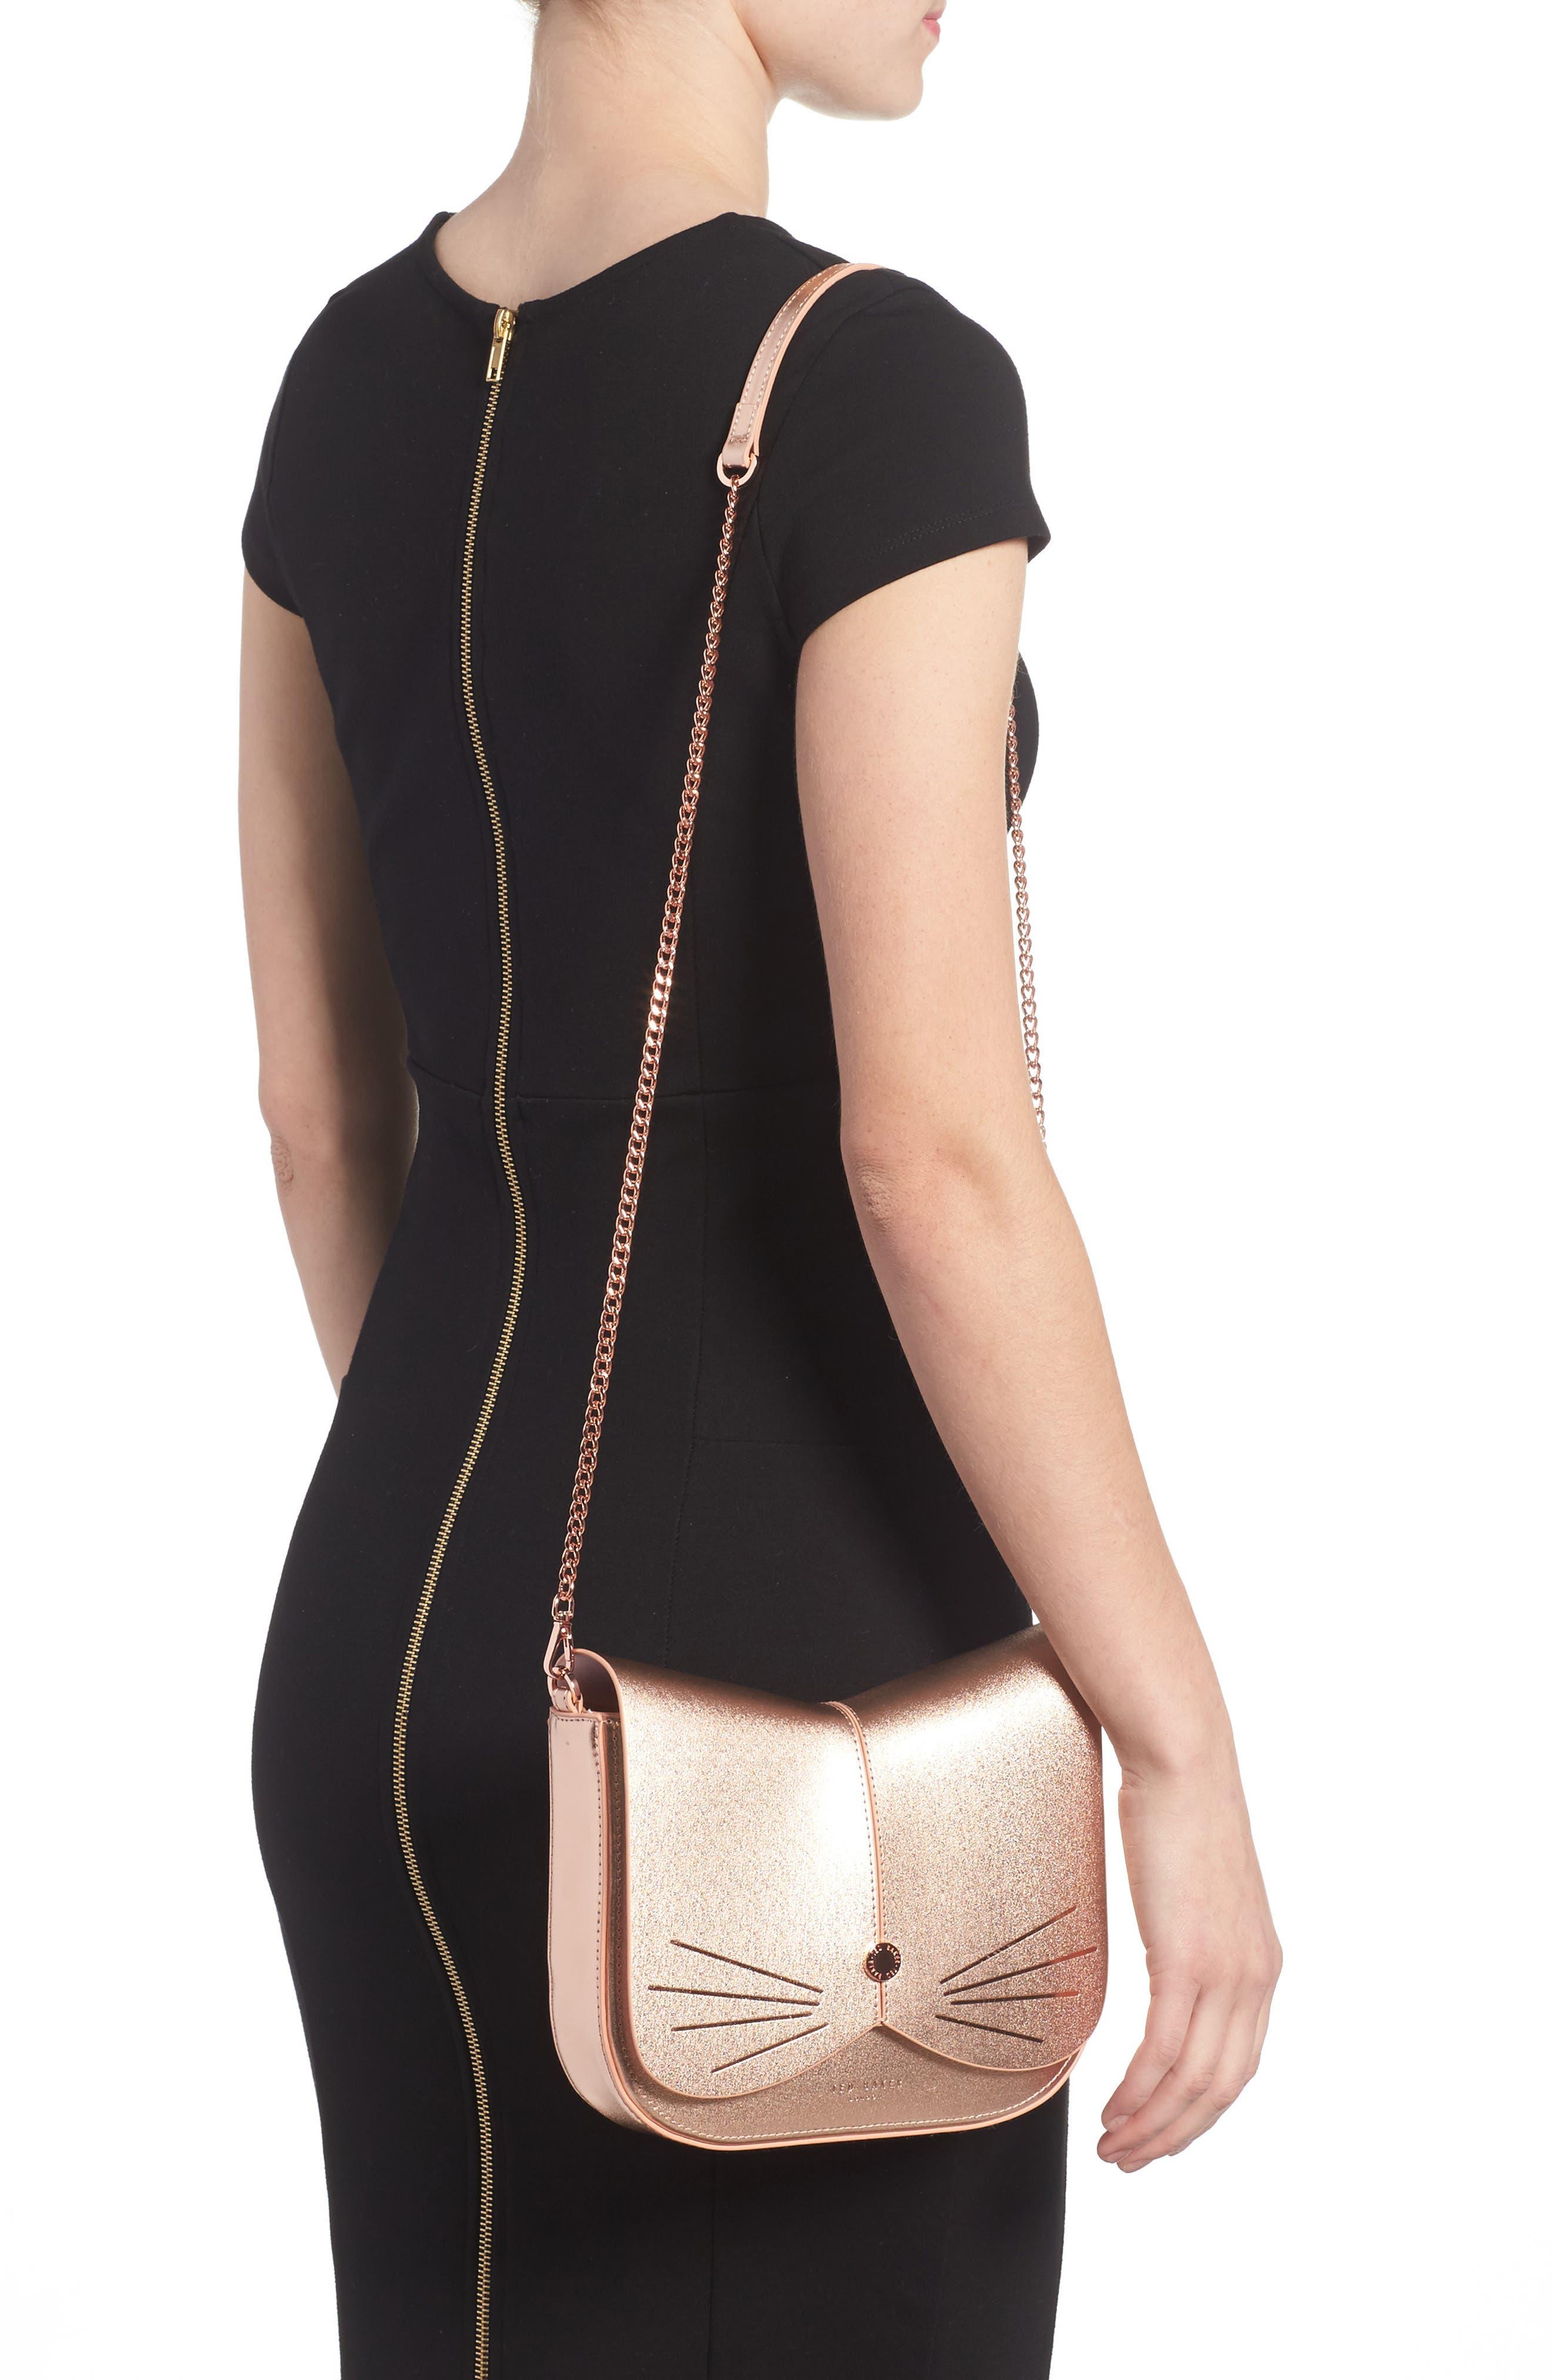 Kittii Cat Leather Crossbody Bag,                             Alternate thumbnail 2, color,                             Rose Gold